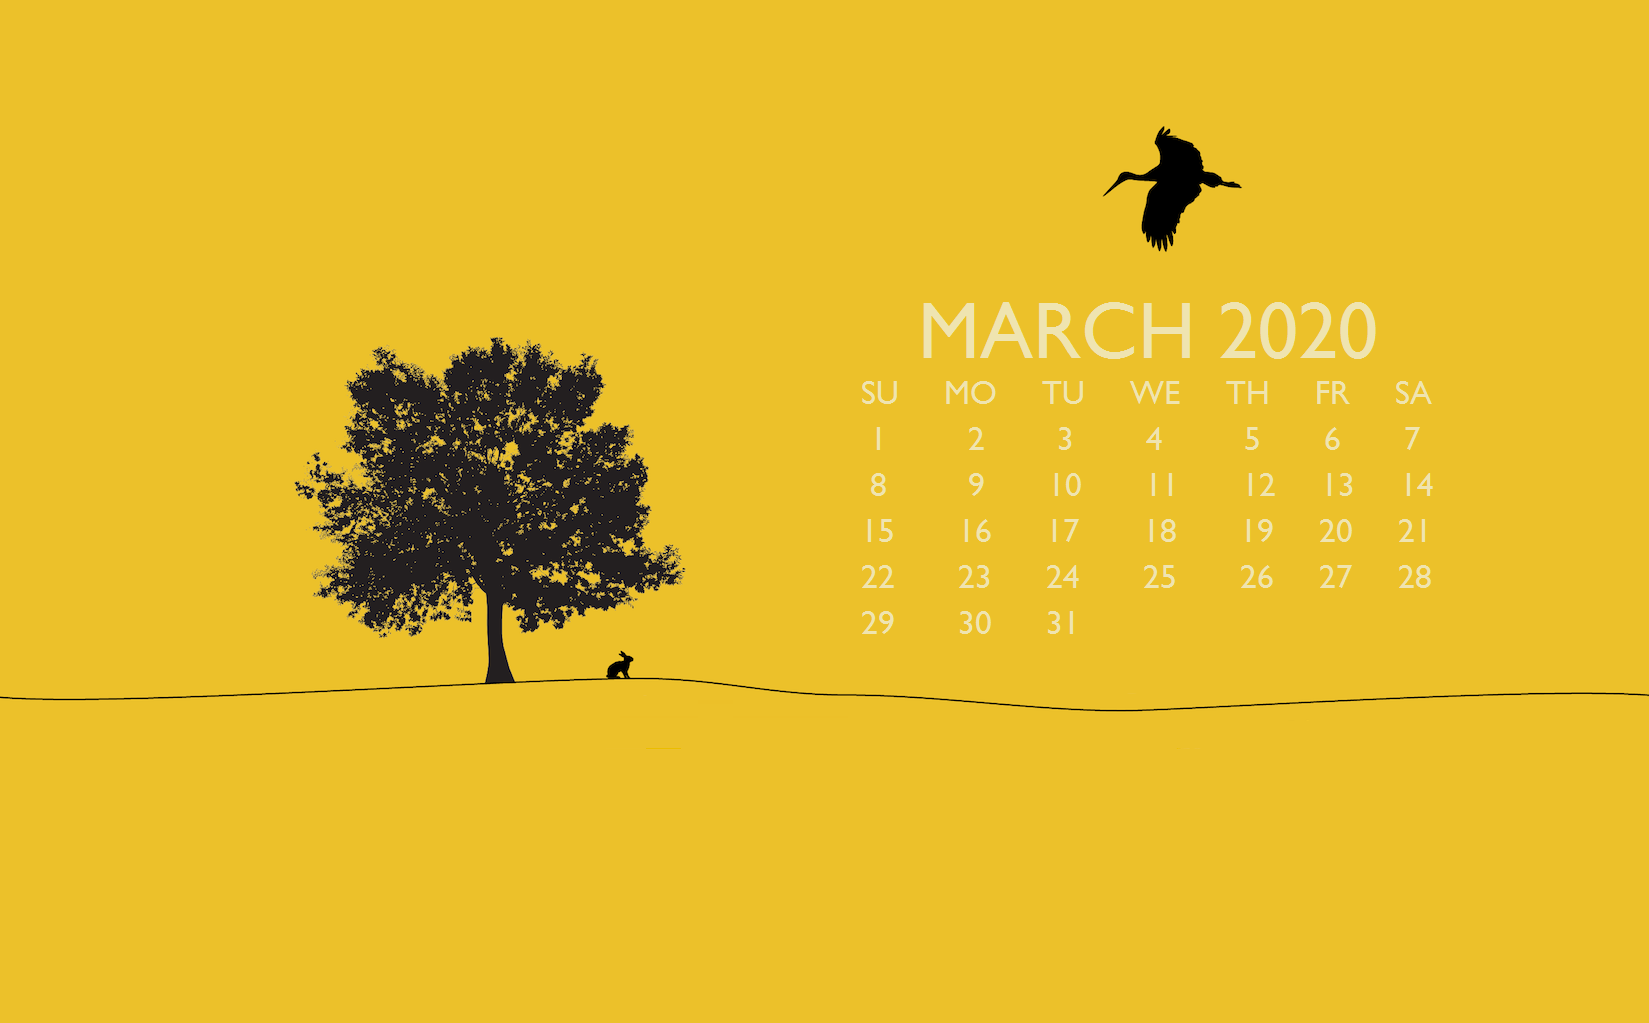 March 2020 Laptop Background Wallpaper In 2020 Calendar Wallpaper Calendar Background Calendar Printables